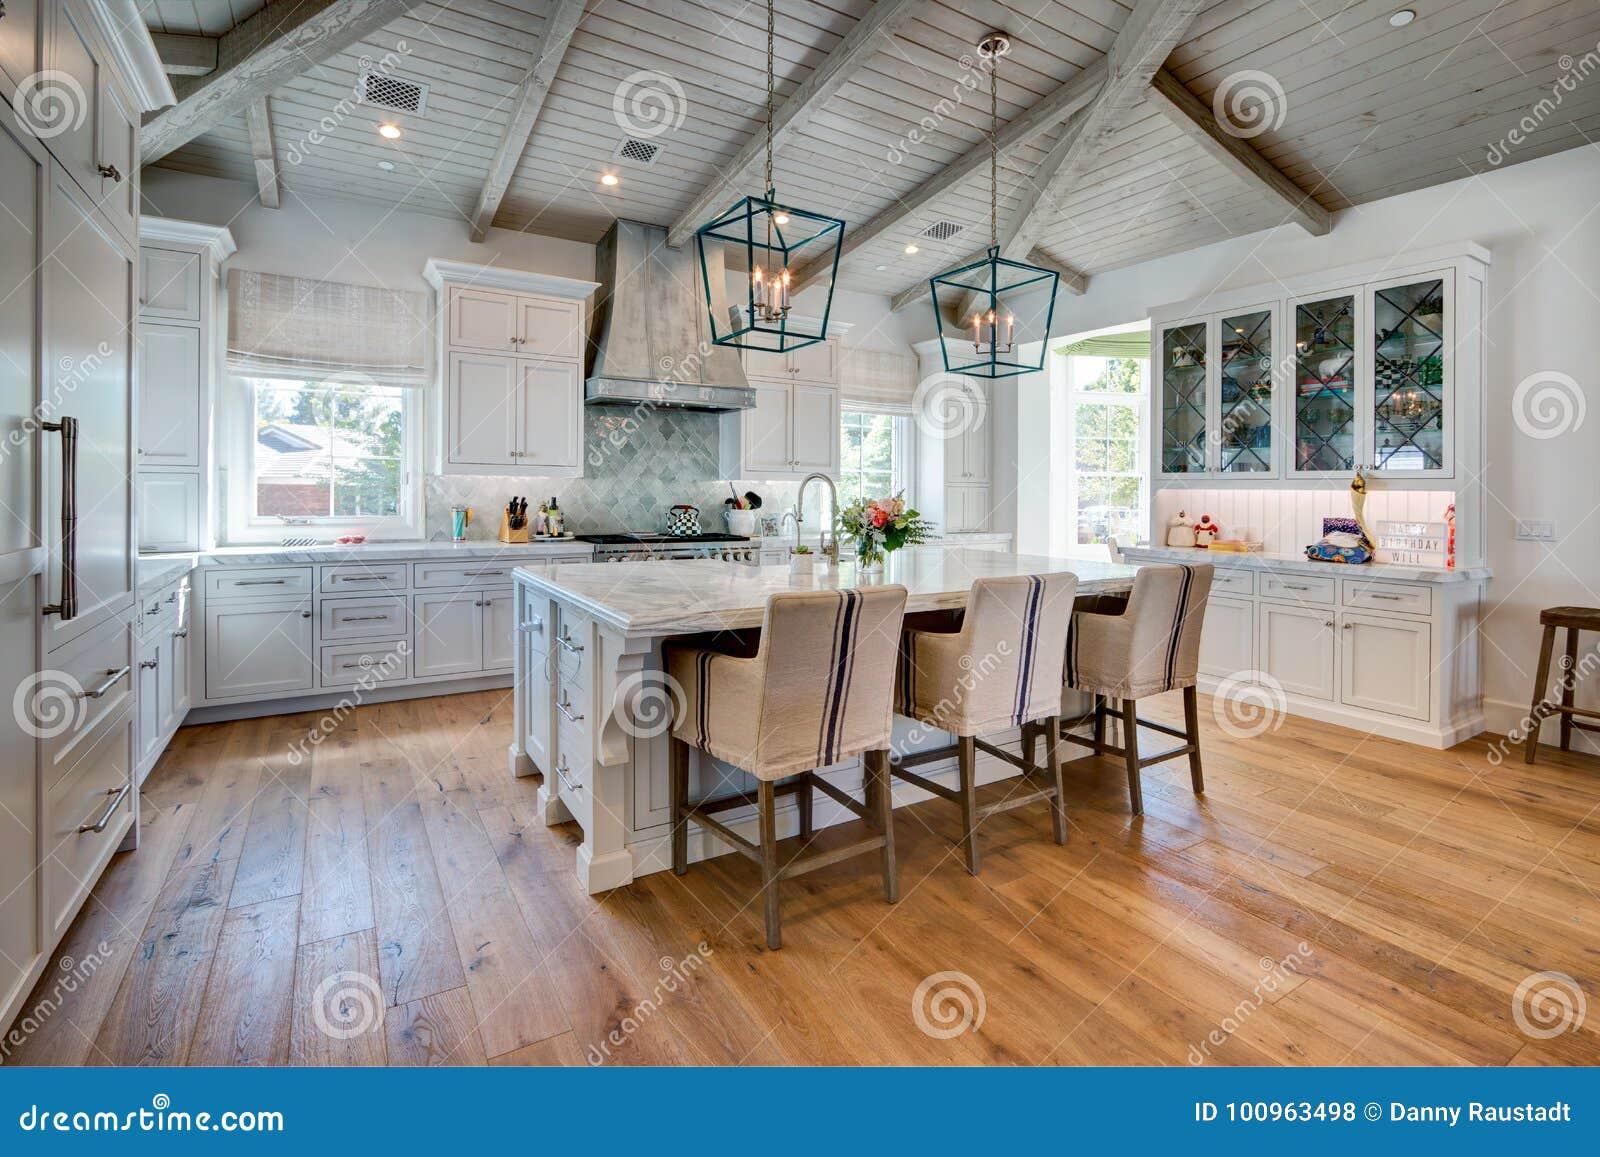 Enorme helle moderne Hauptküche